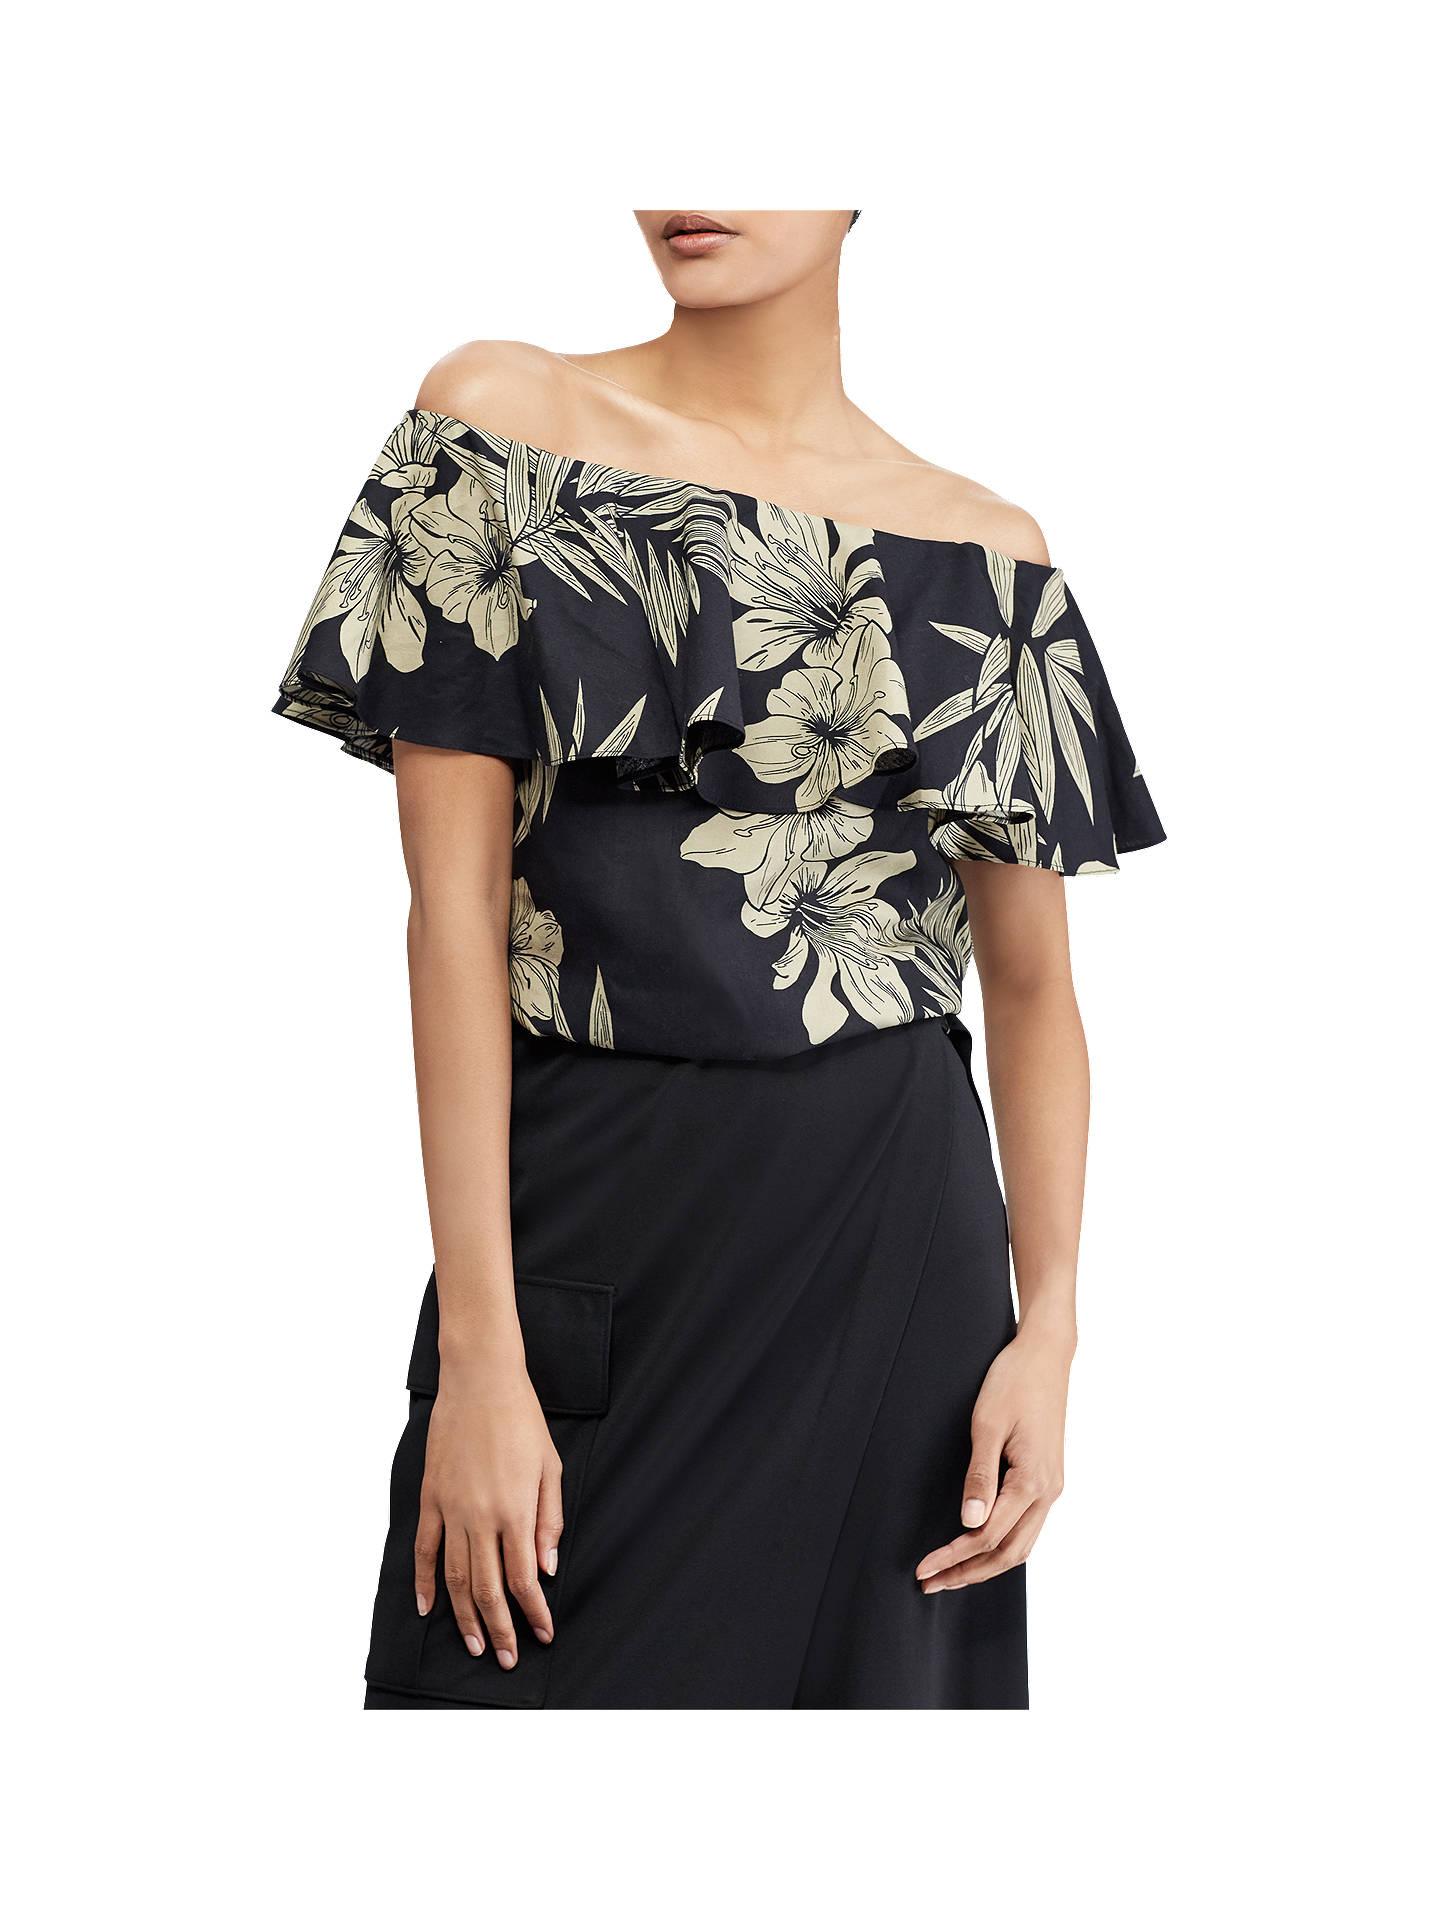 56245c155bb9a Buy Polo Ralph Lauren Floral Off-the-Shoulder Top